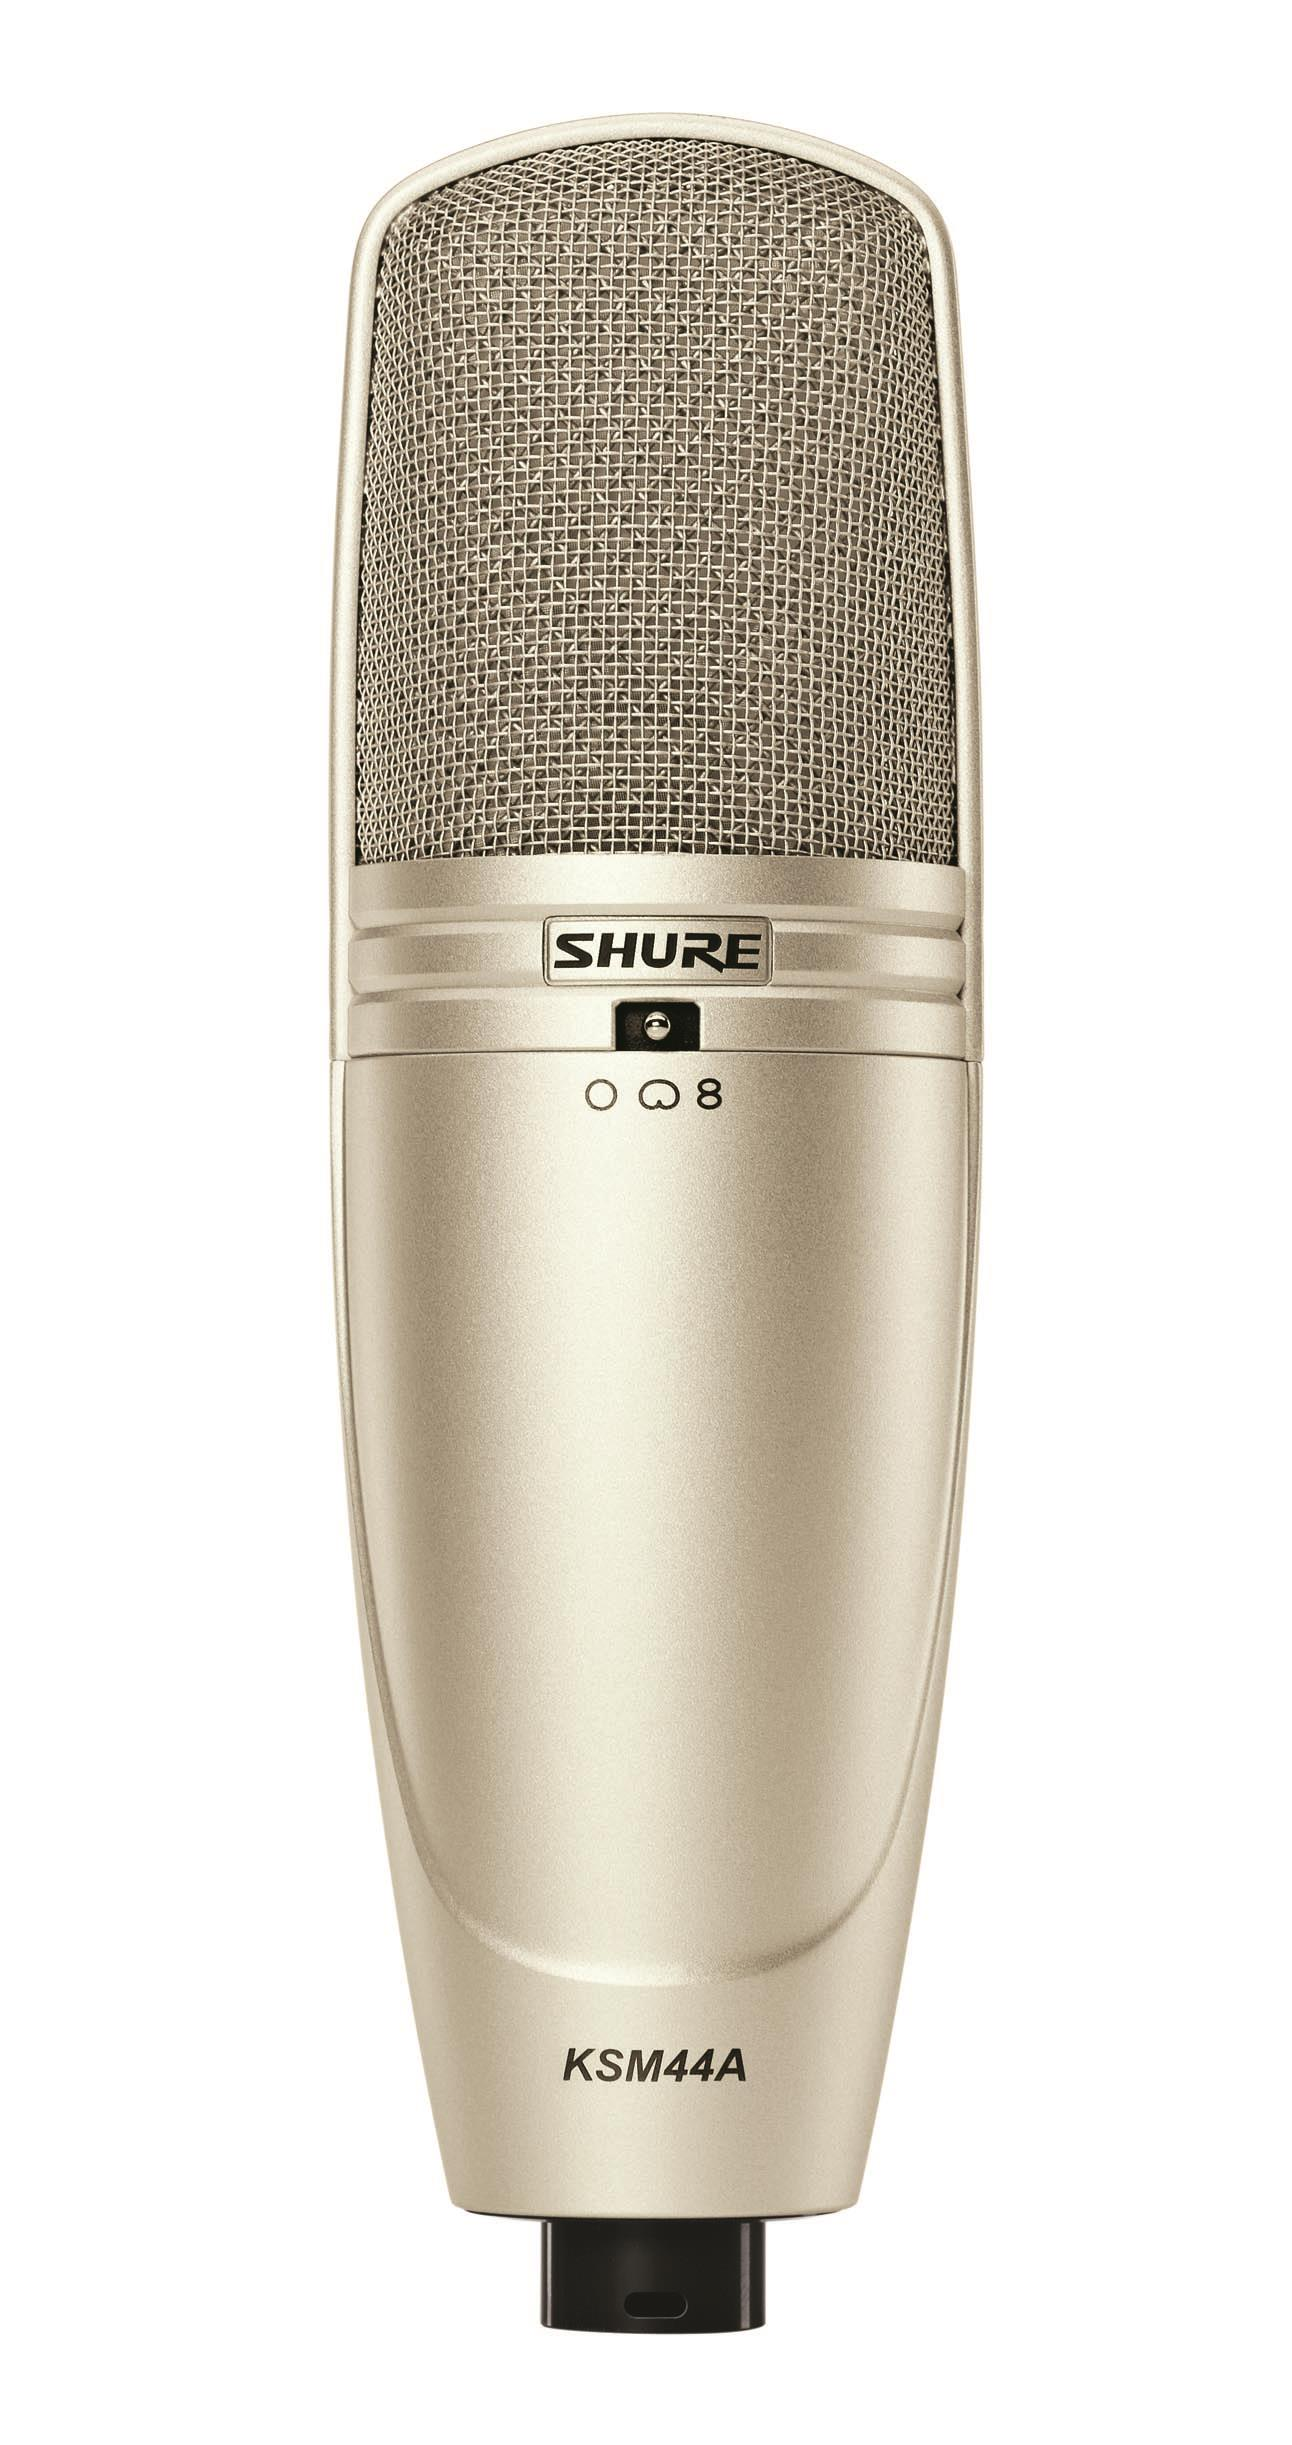 Shure KSM44A Microphone